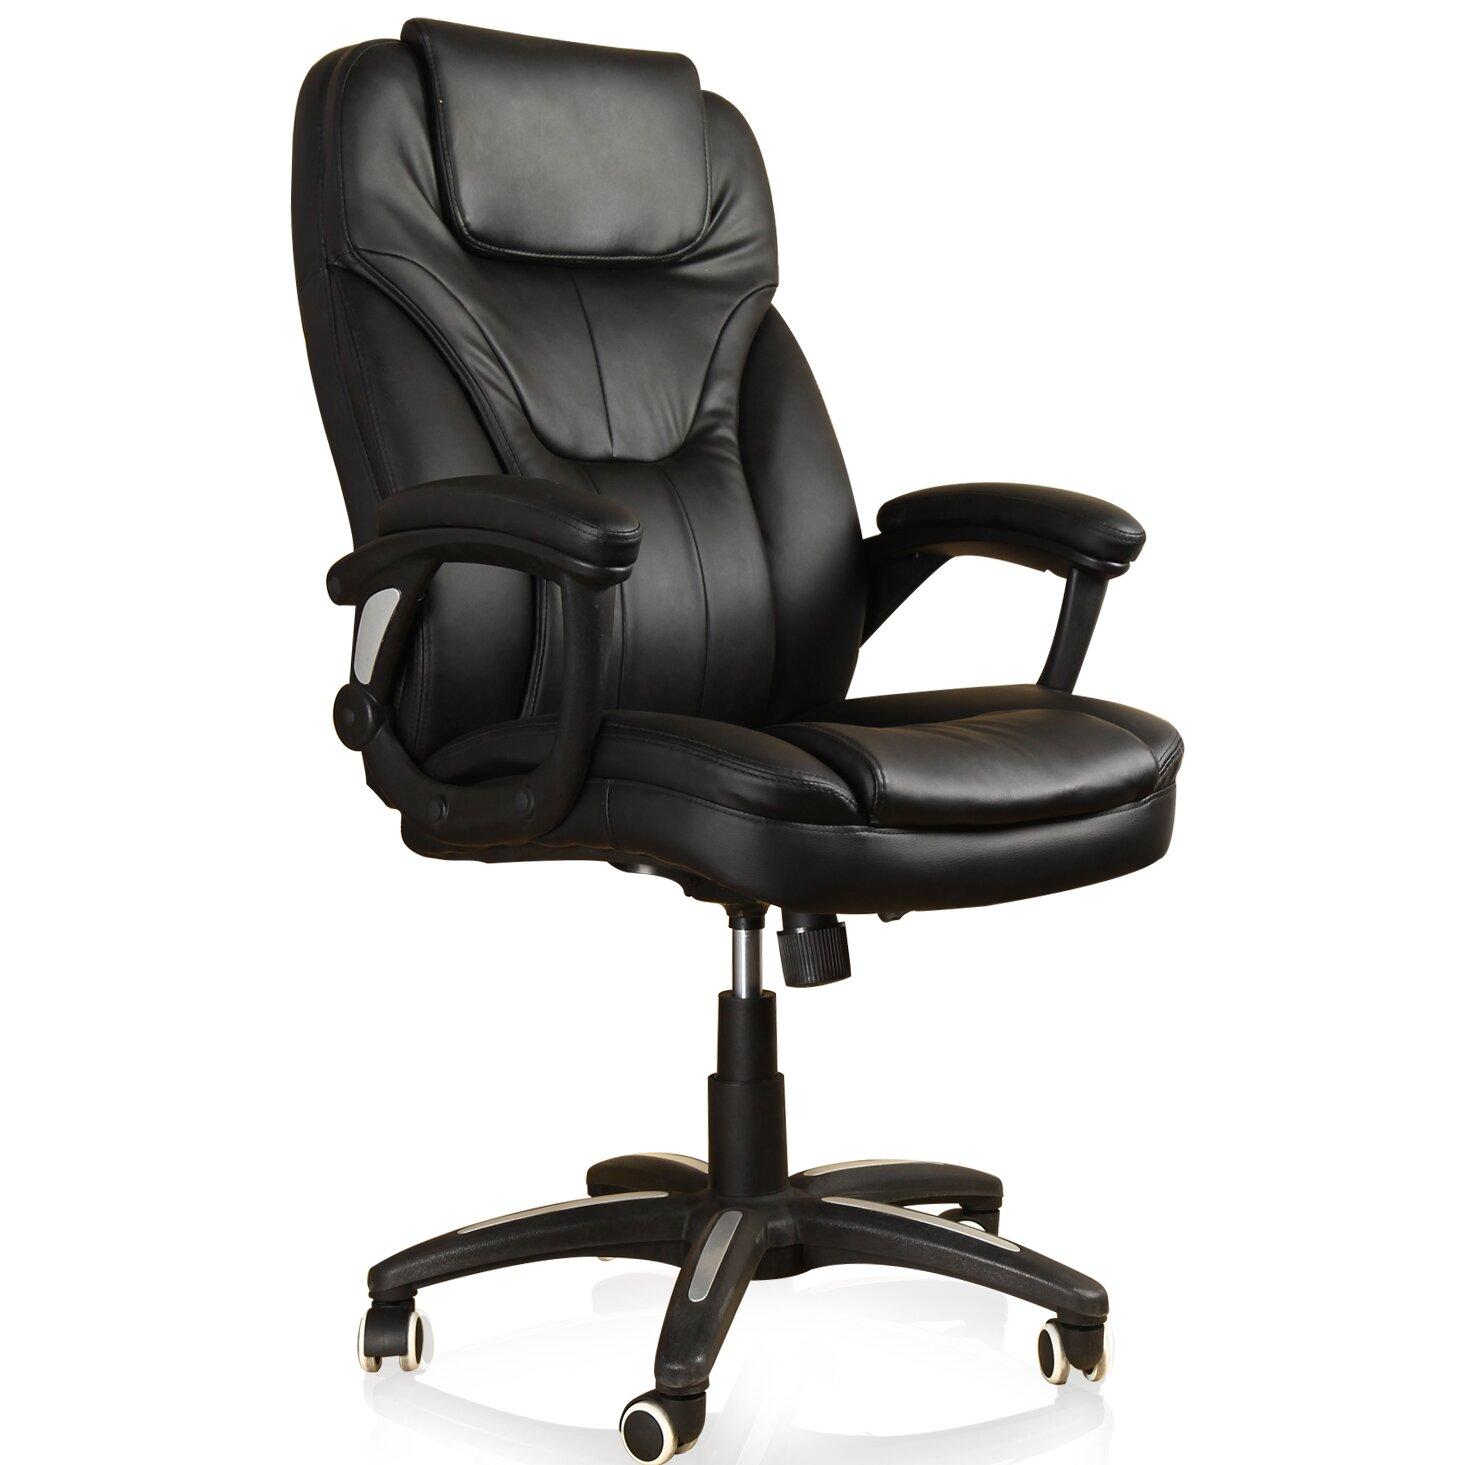 Adecotrading Deluxe High Back Executive Office Chair Wayfair